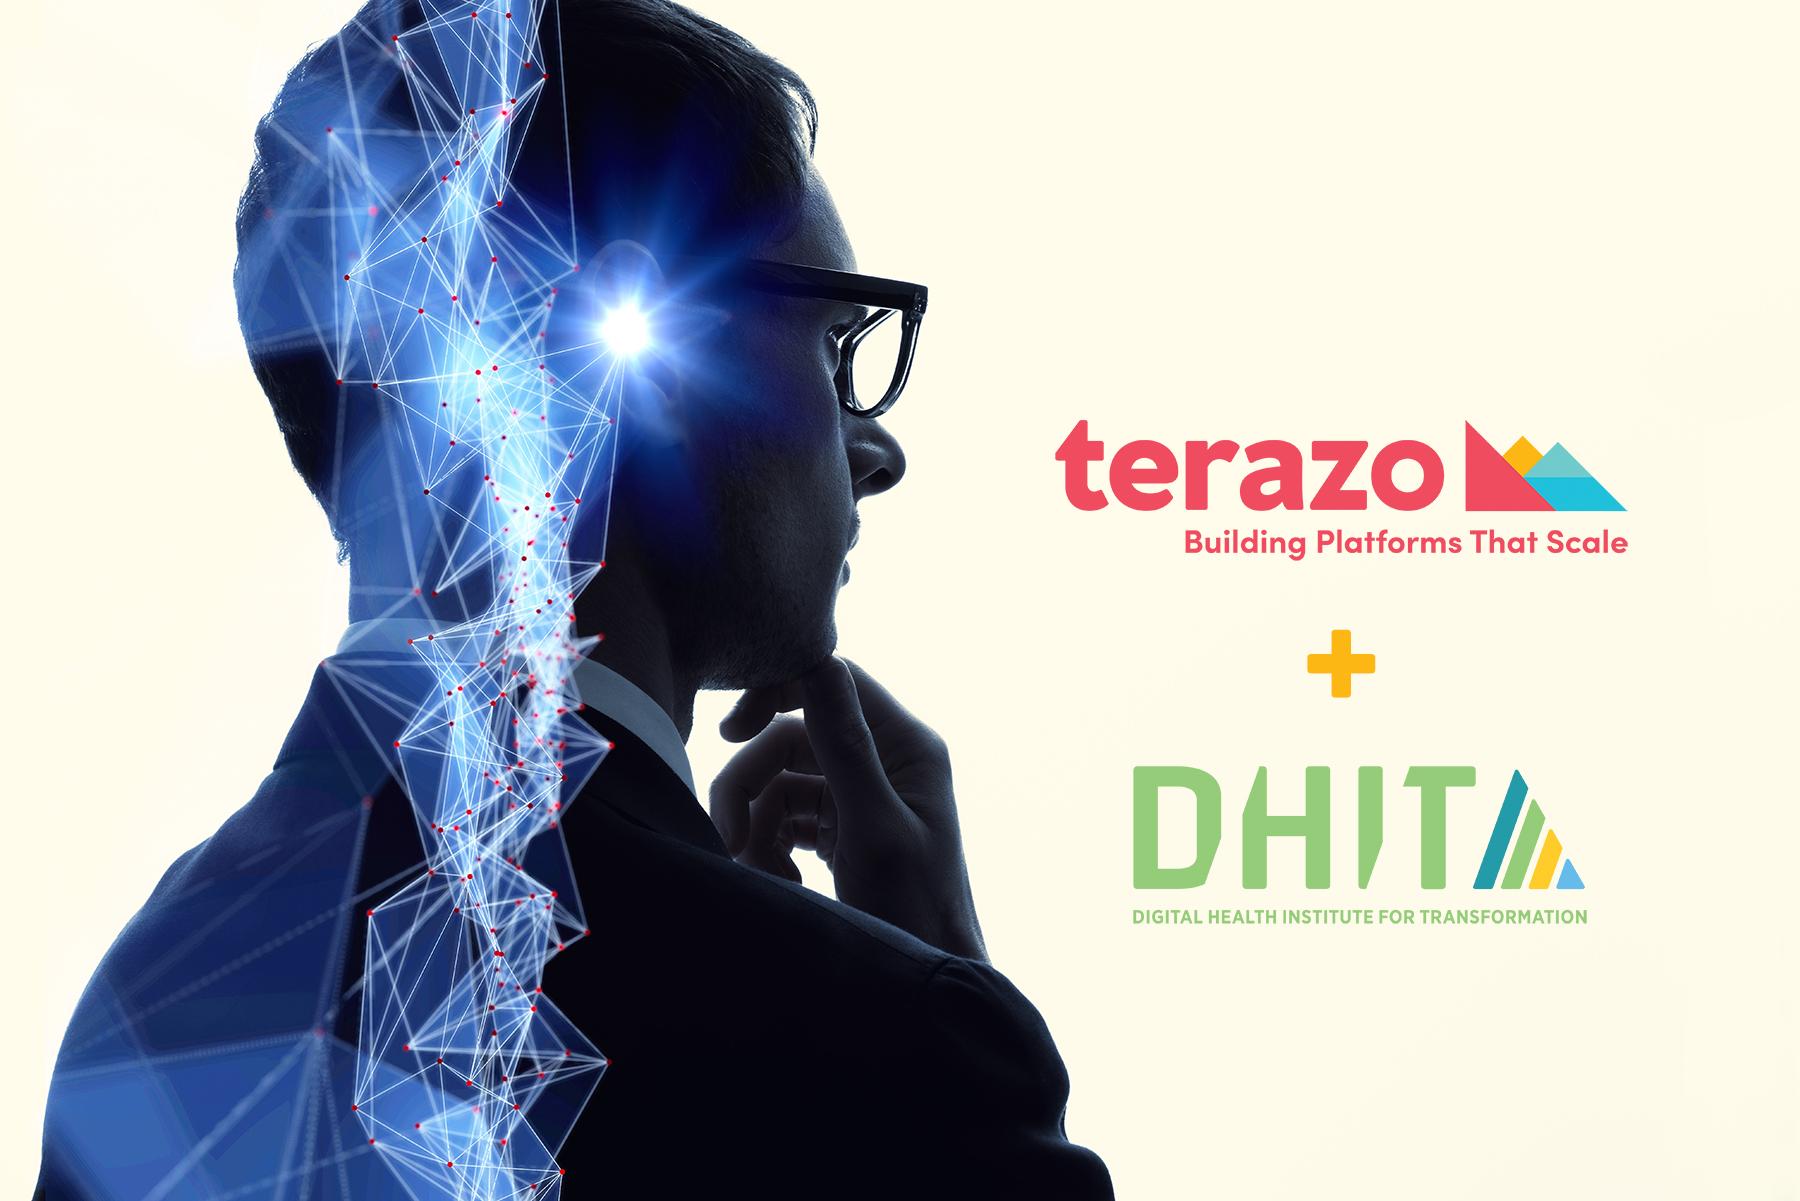 Terazo + DHIT